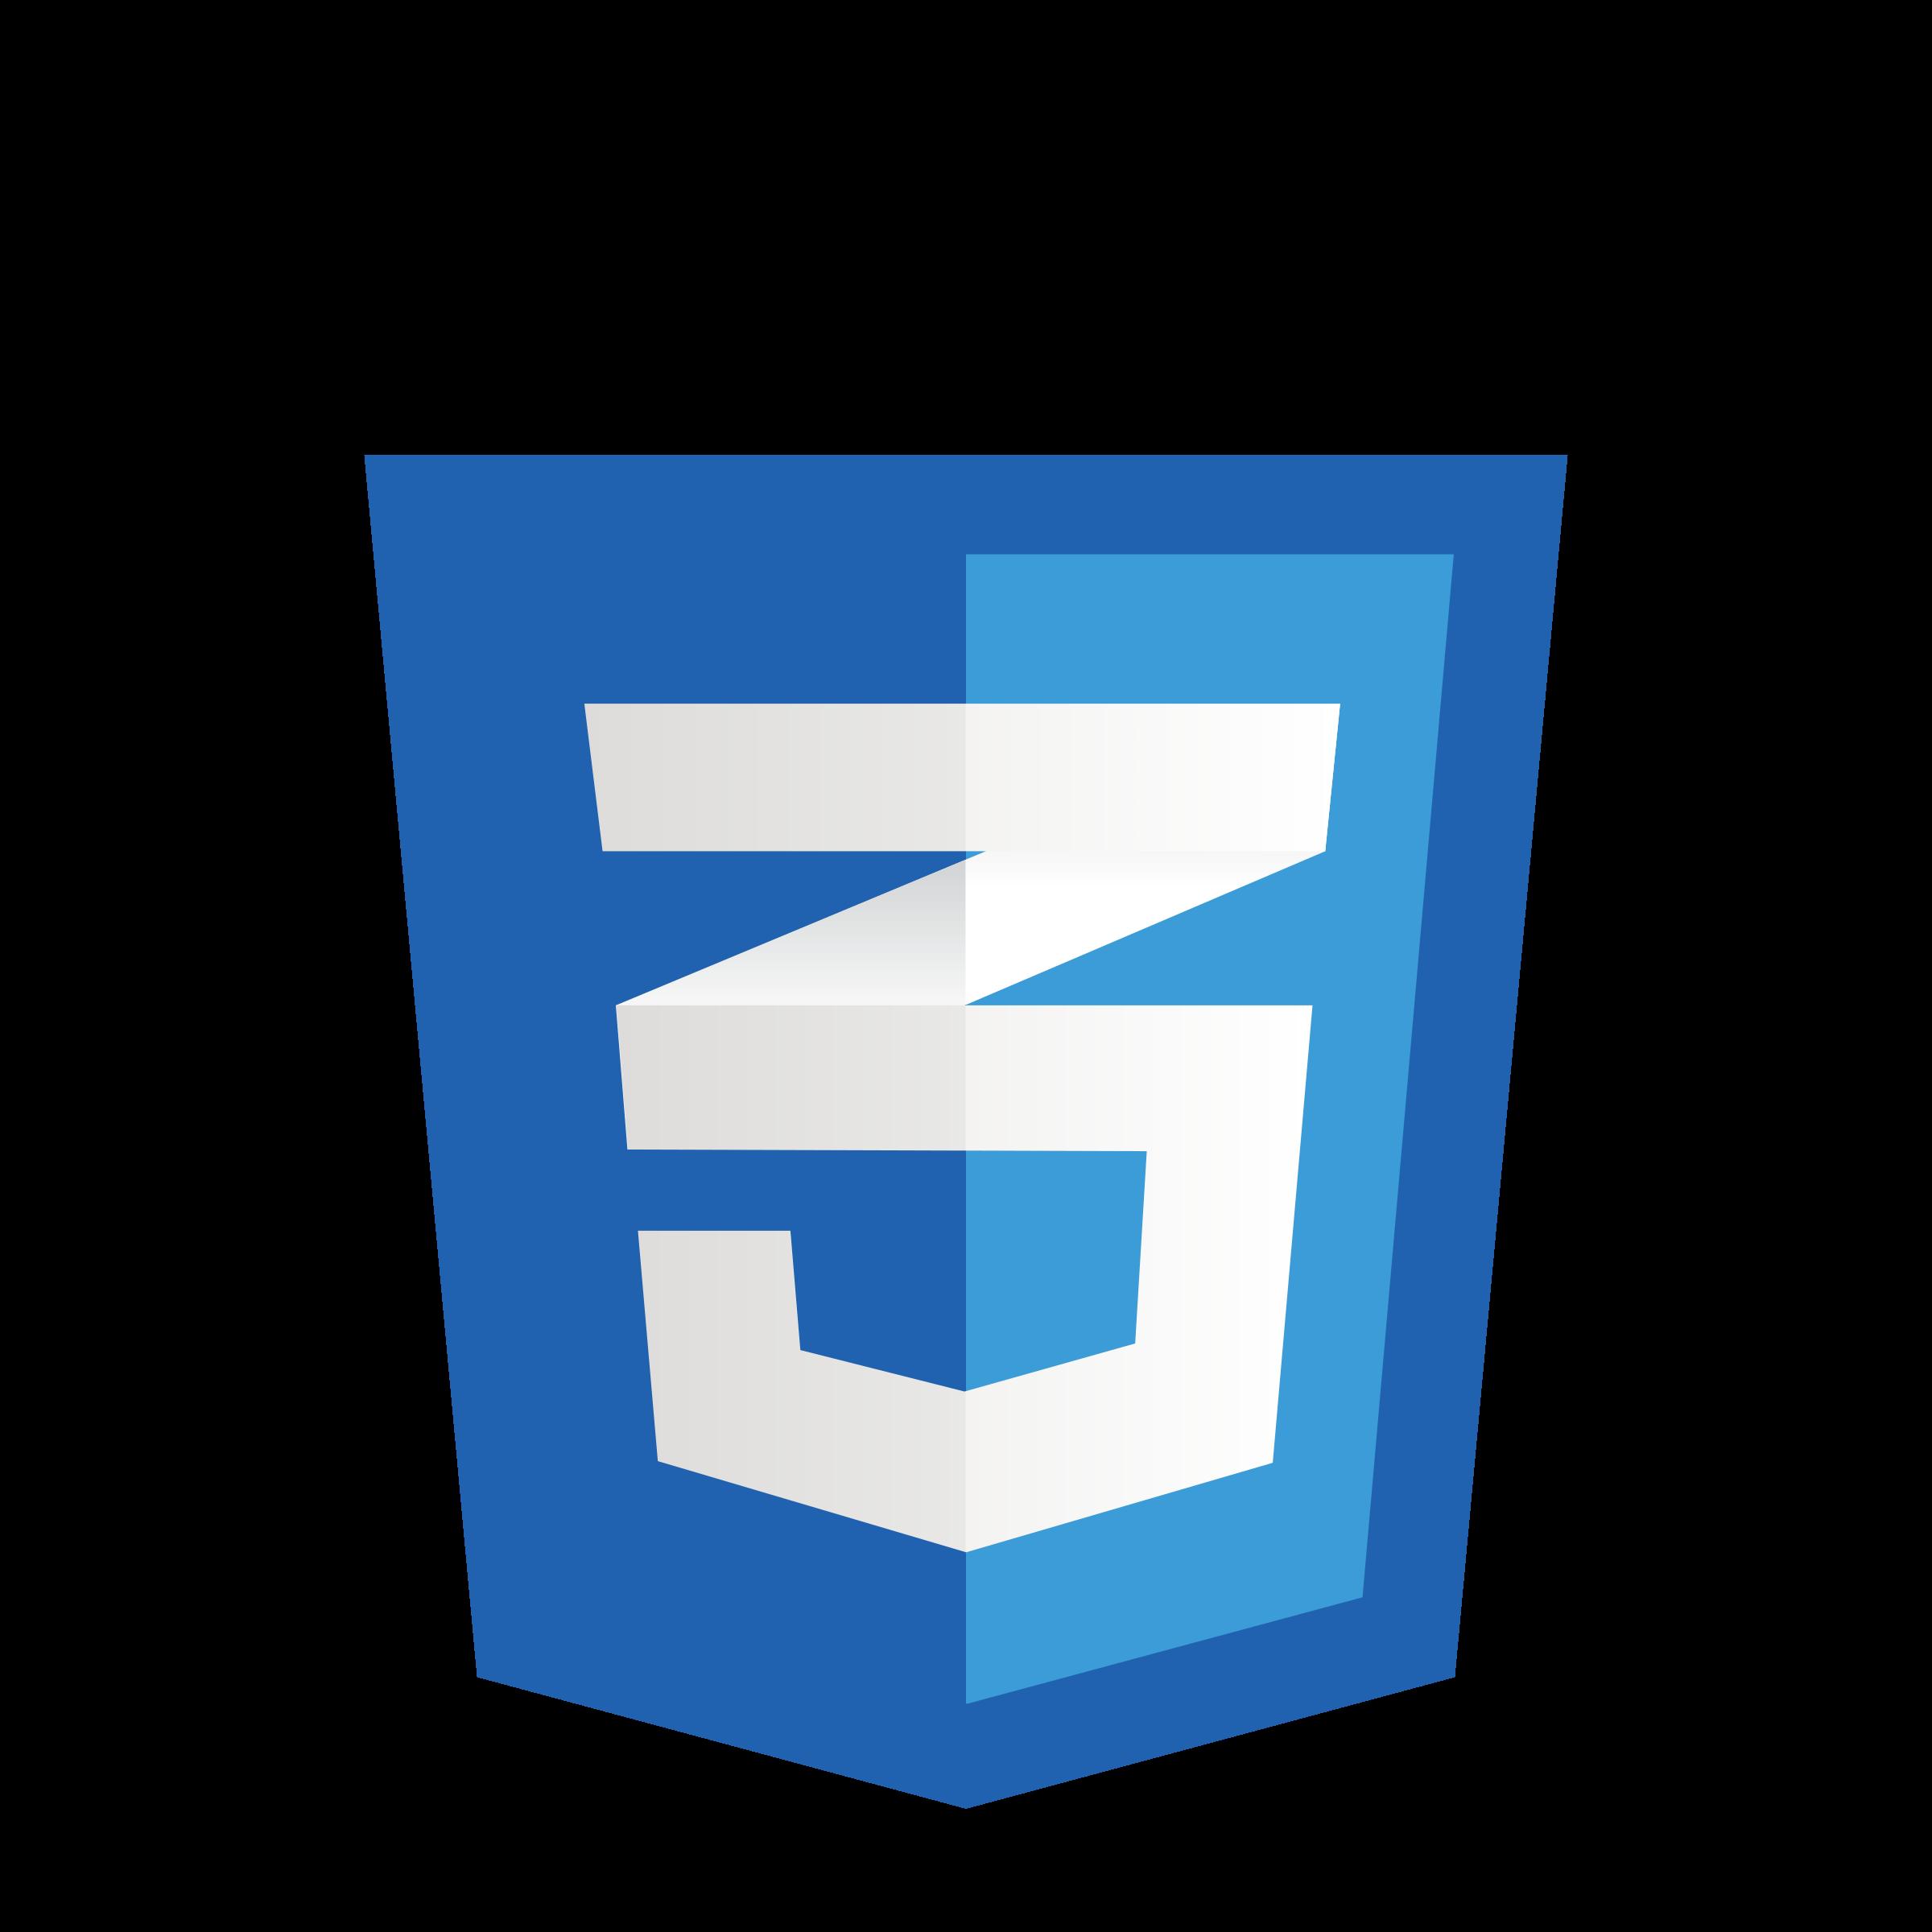 CSS3 Logo PNG Transparent & SVG Vector.